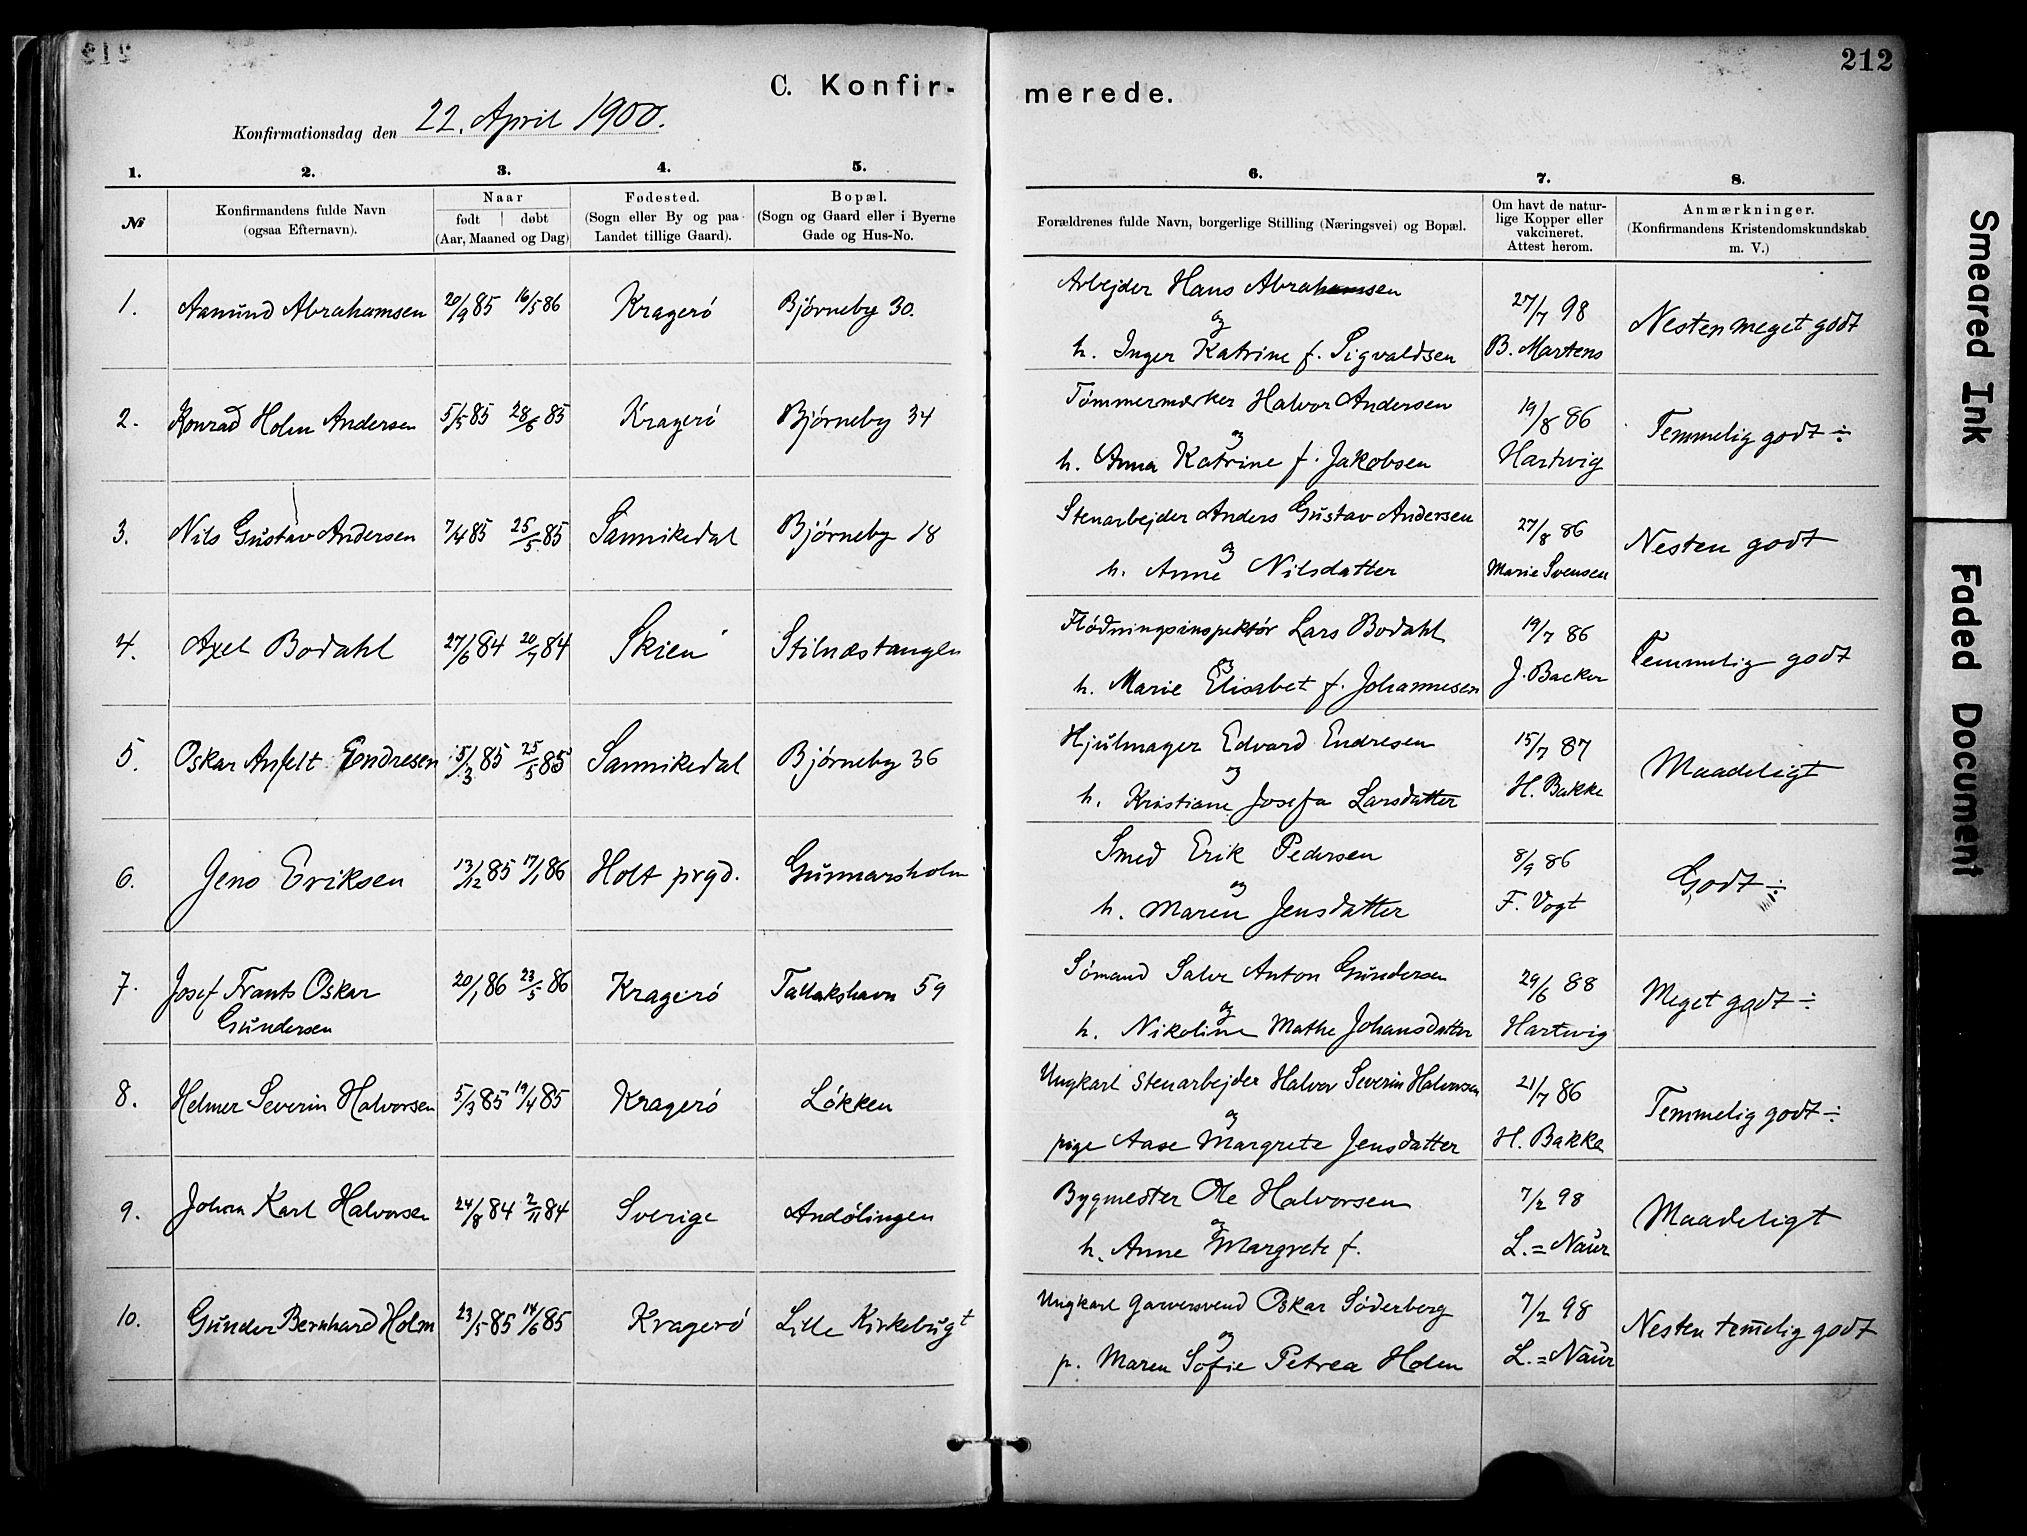 SAKO, Kragerø kirkebøker, F/Fa/L0012: Ministerialbok nr. I 12, 1880-1904, s. 212